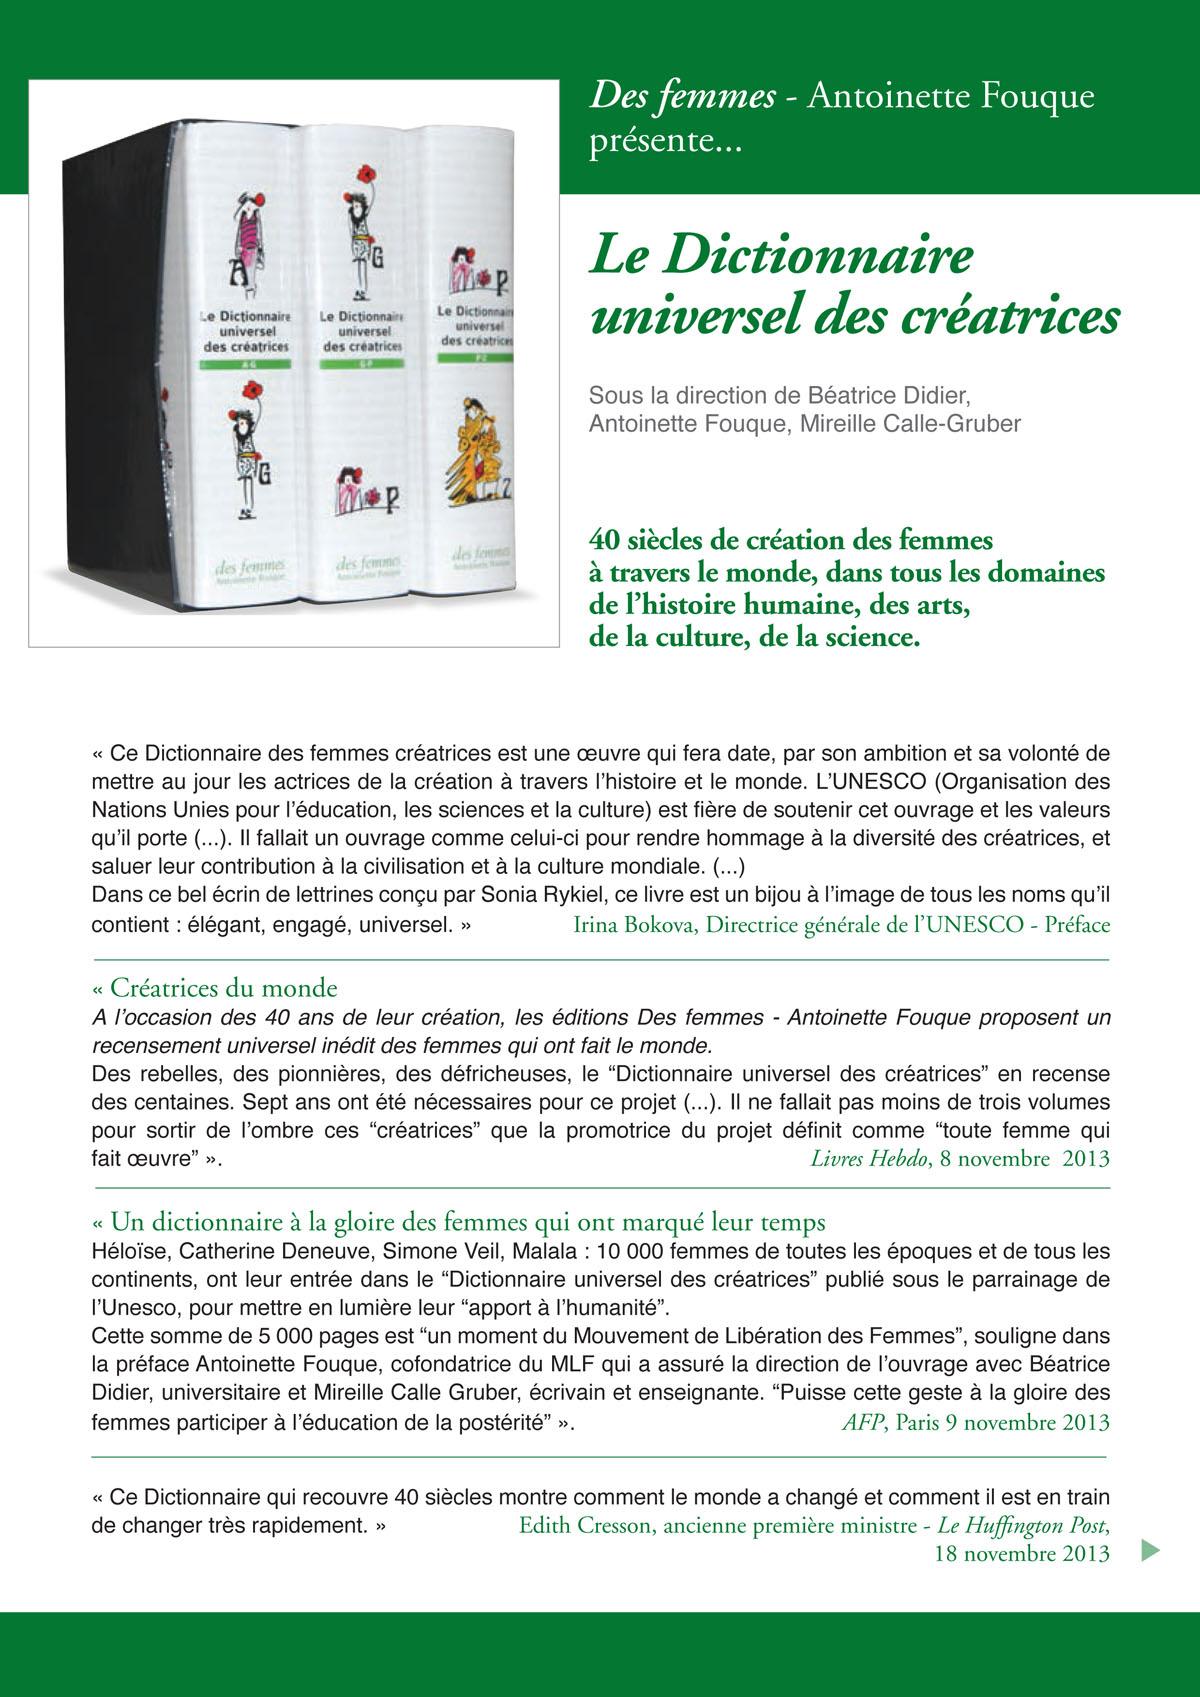 dictionnaire-creatrices-presse1-1